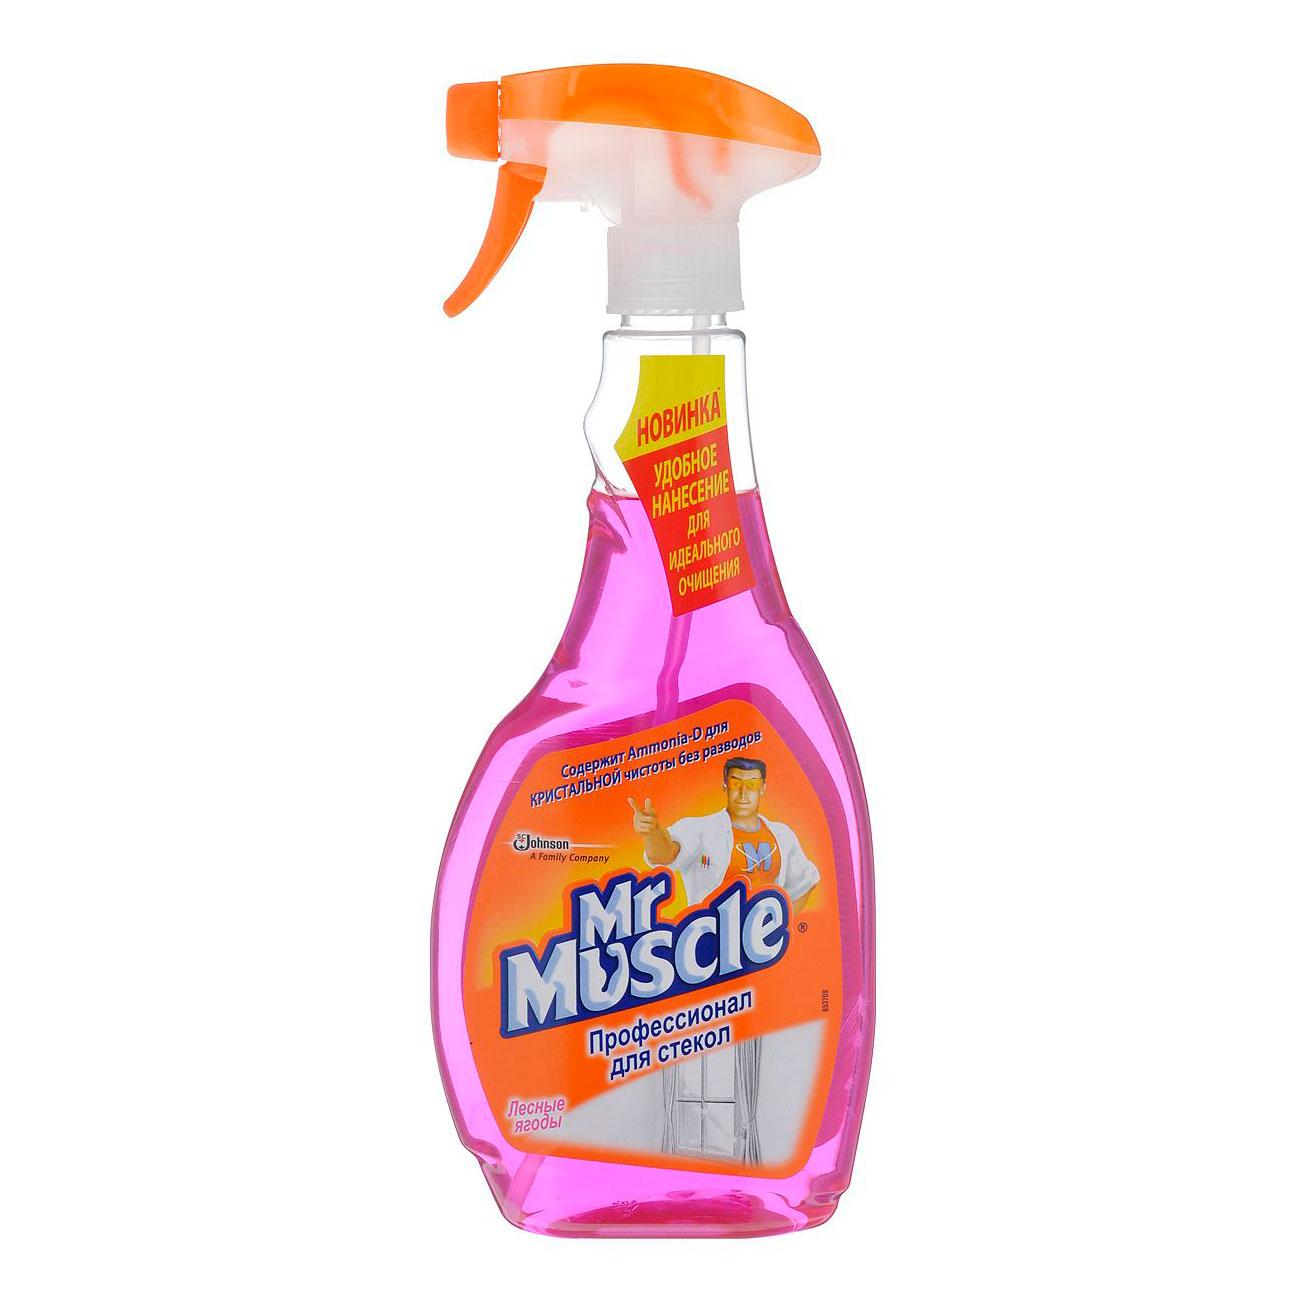 Средство Мистер Мускул триггер 500 мл для стекол с Ammonia-D Лесные ягоды (МИСТЕР МУСКУЛ)